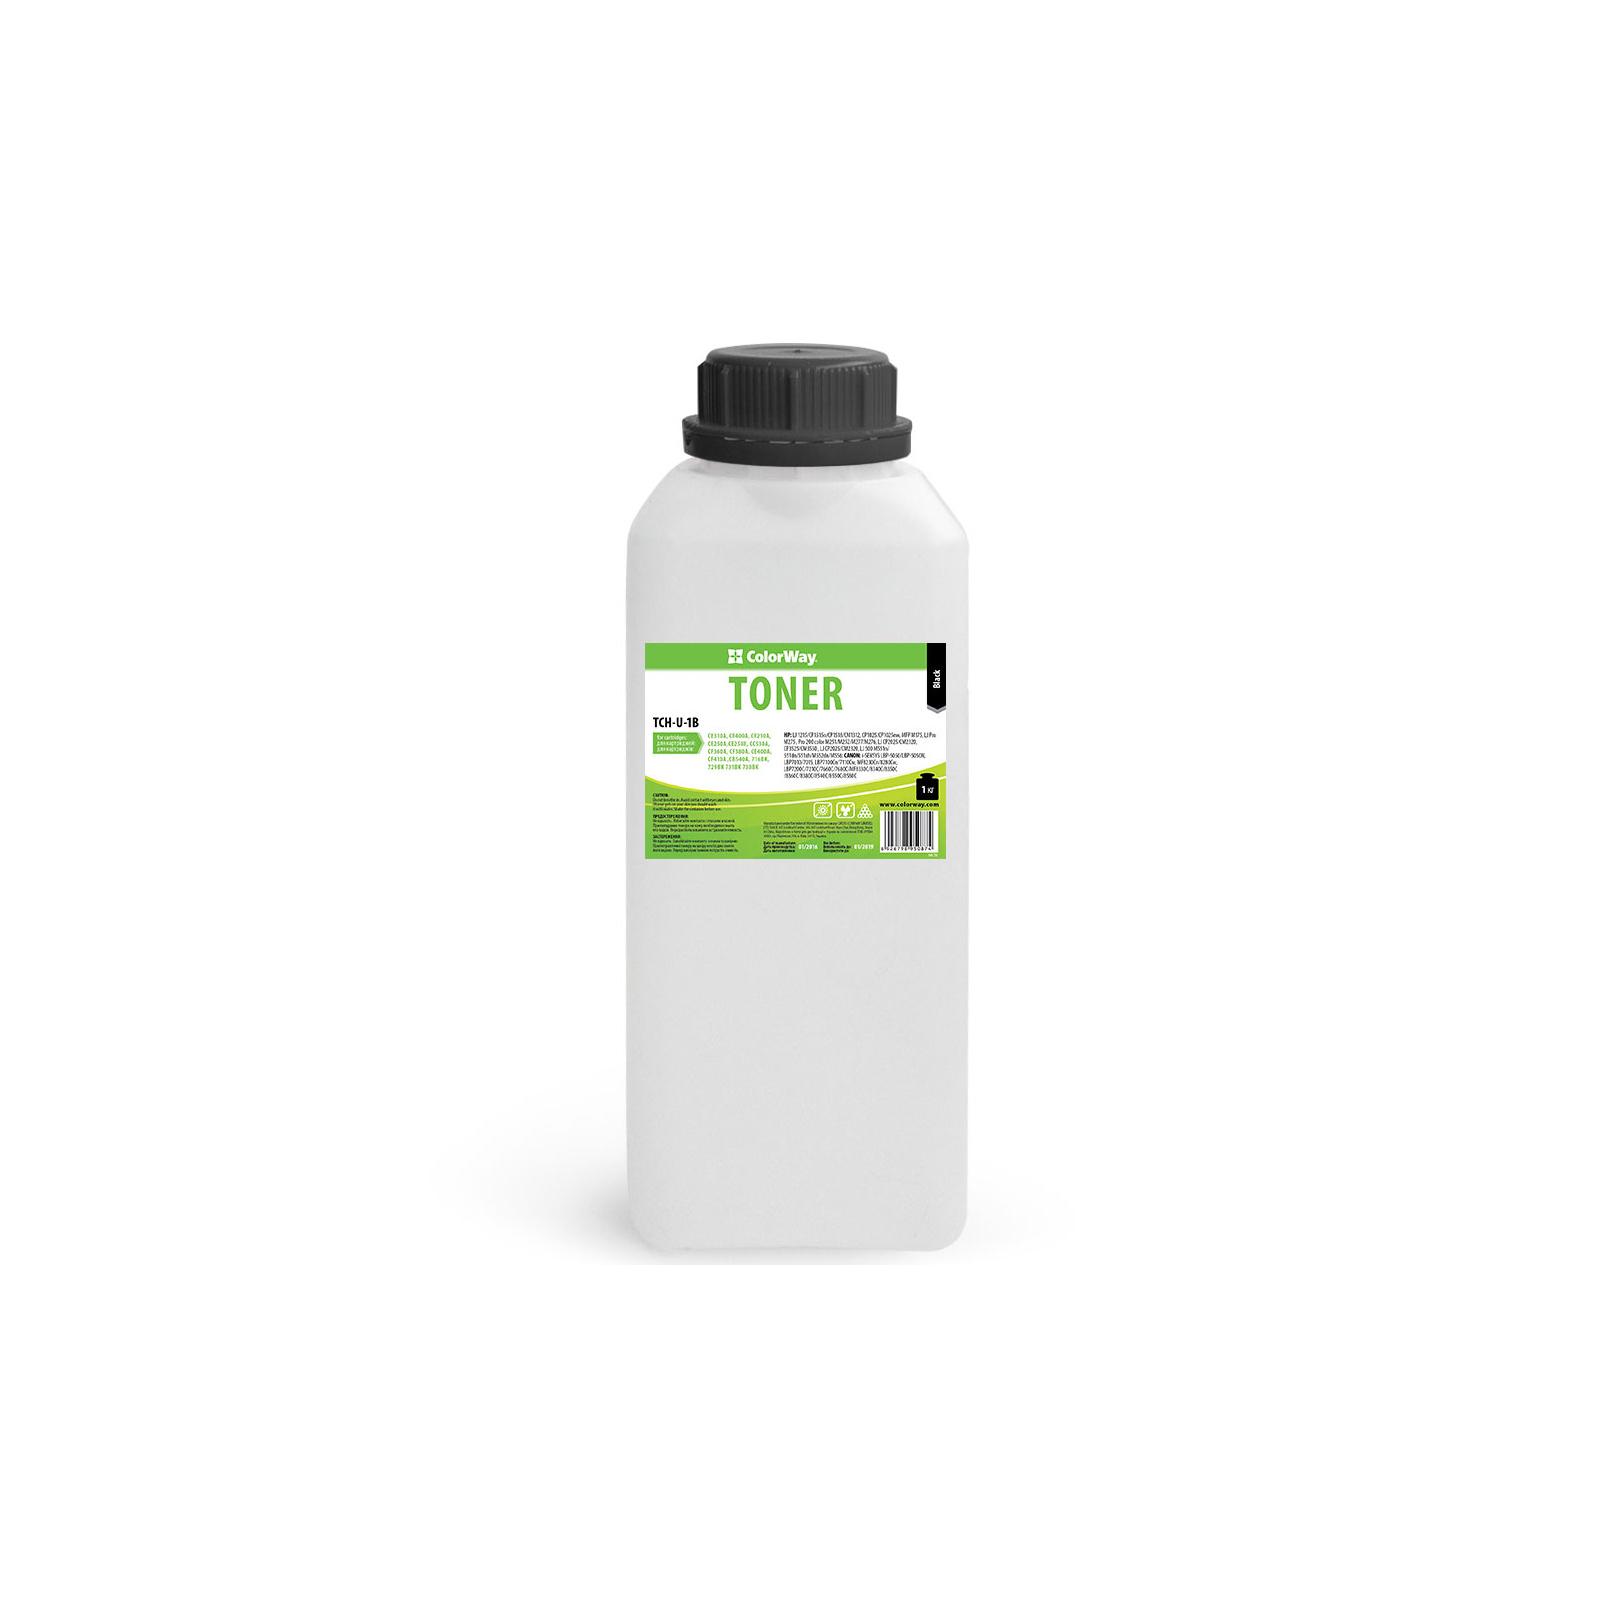 Тонер HP CLJ Universal color Black 1kg ColorWay (TCH-U-1B)